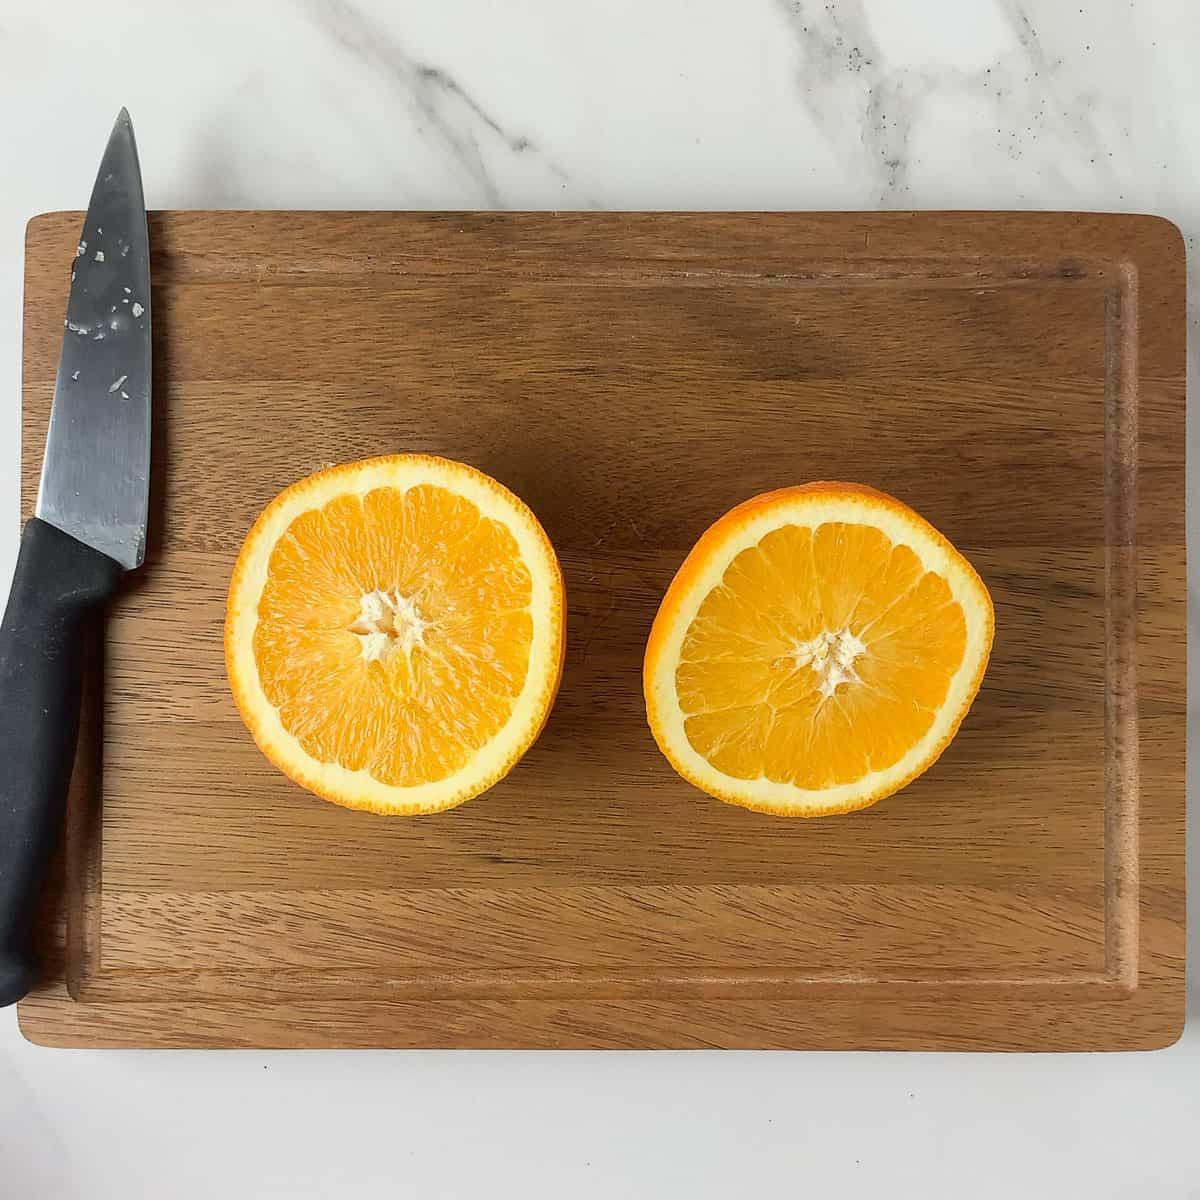 navel oranges sliced in half on wood cutting board